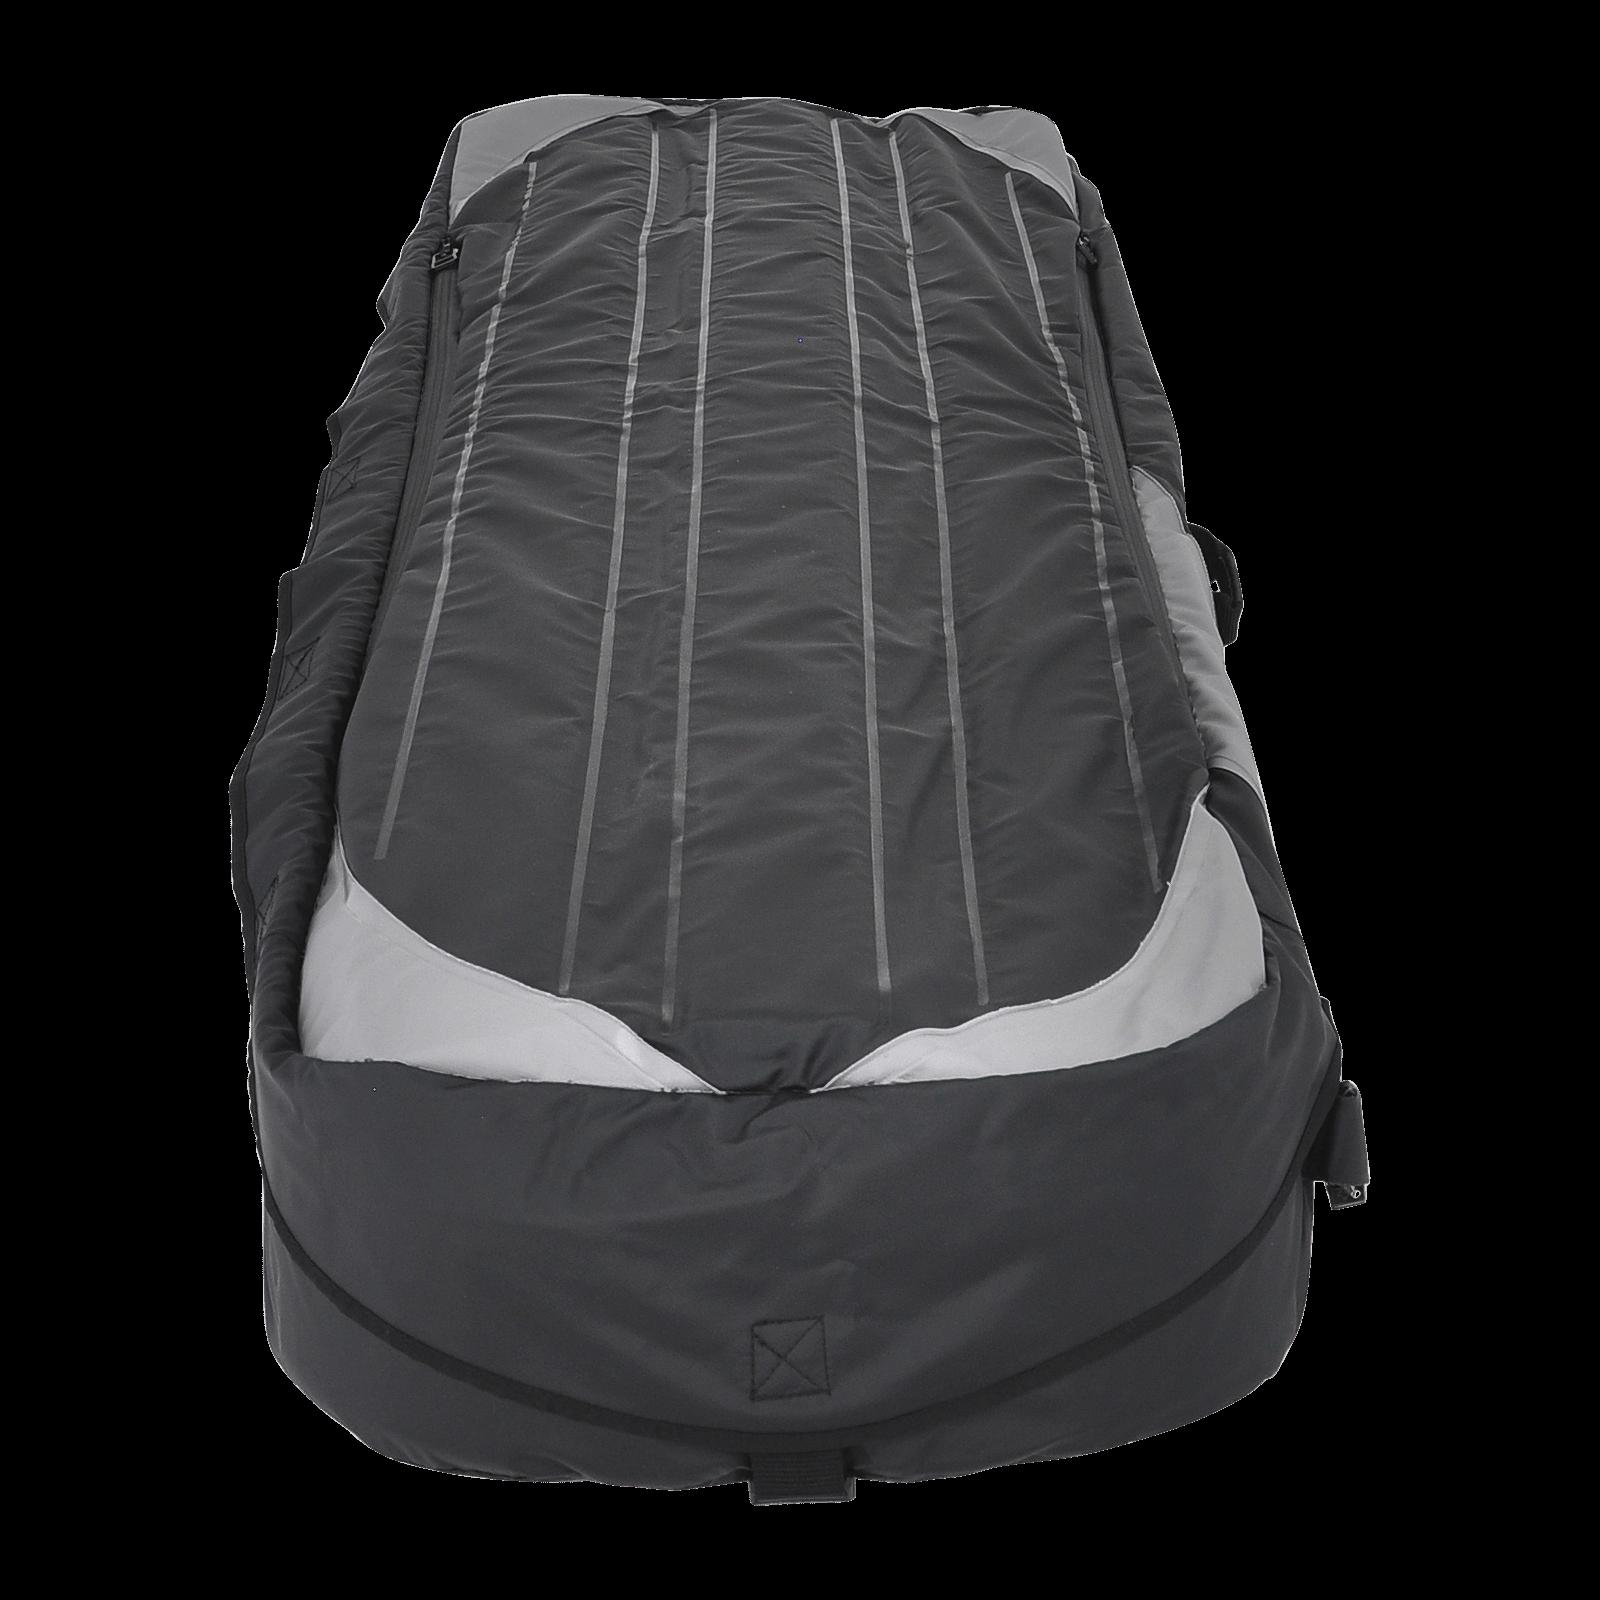 Dachbox Thule Ranger 500 Black/Silver Gray - Bild 2